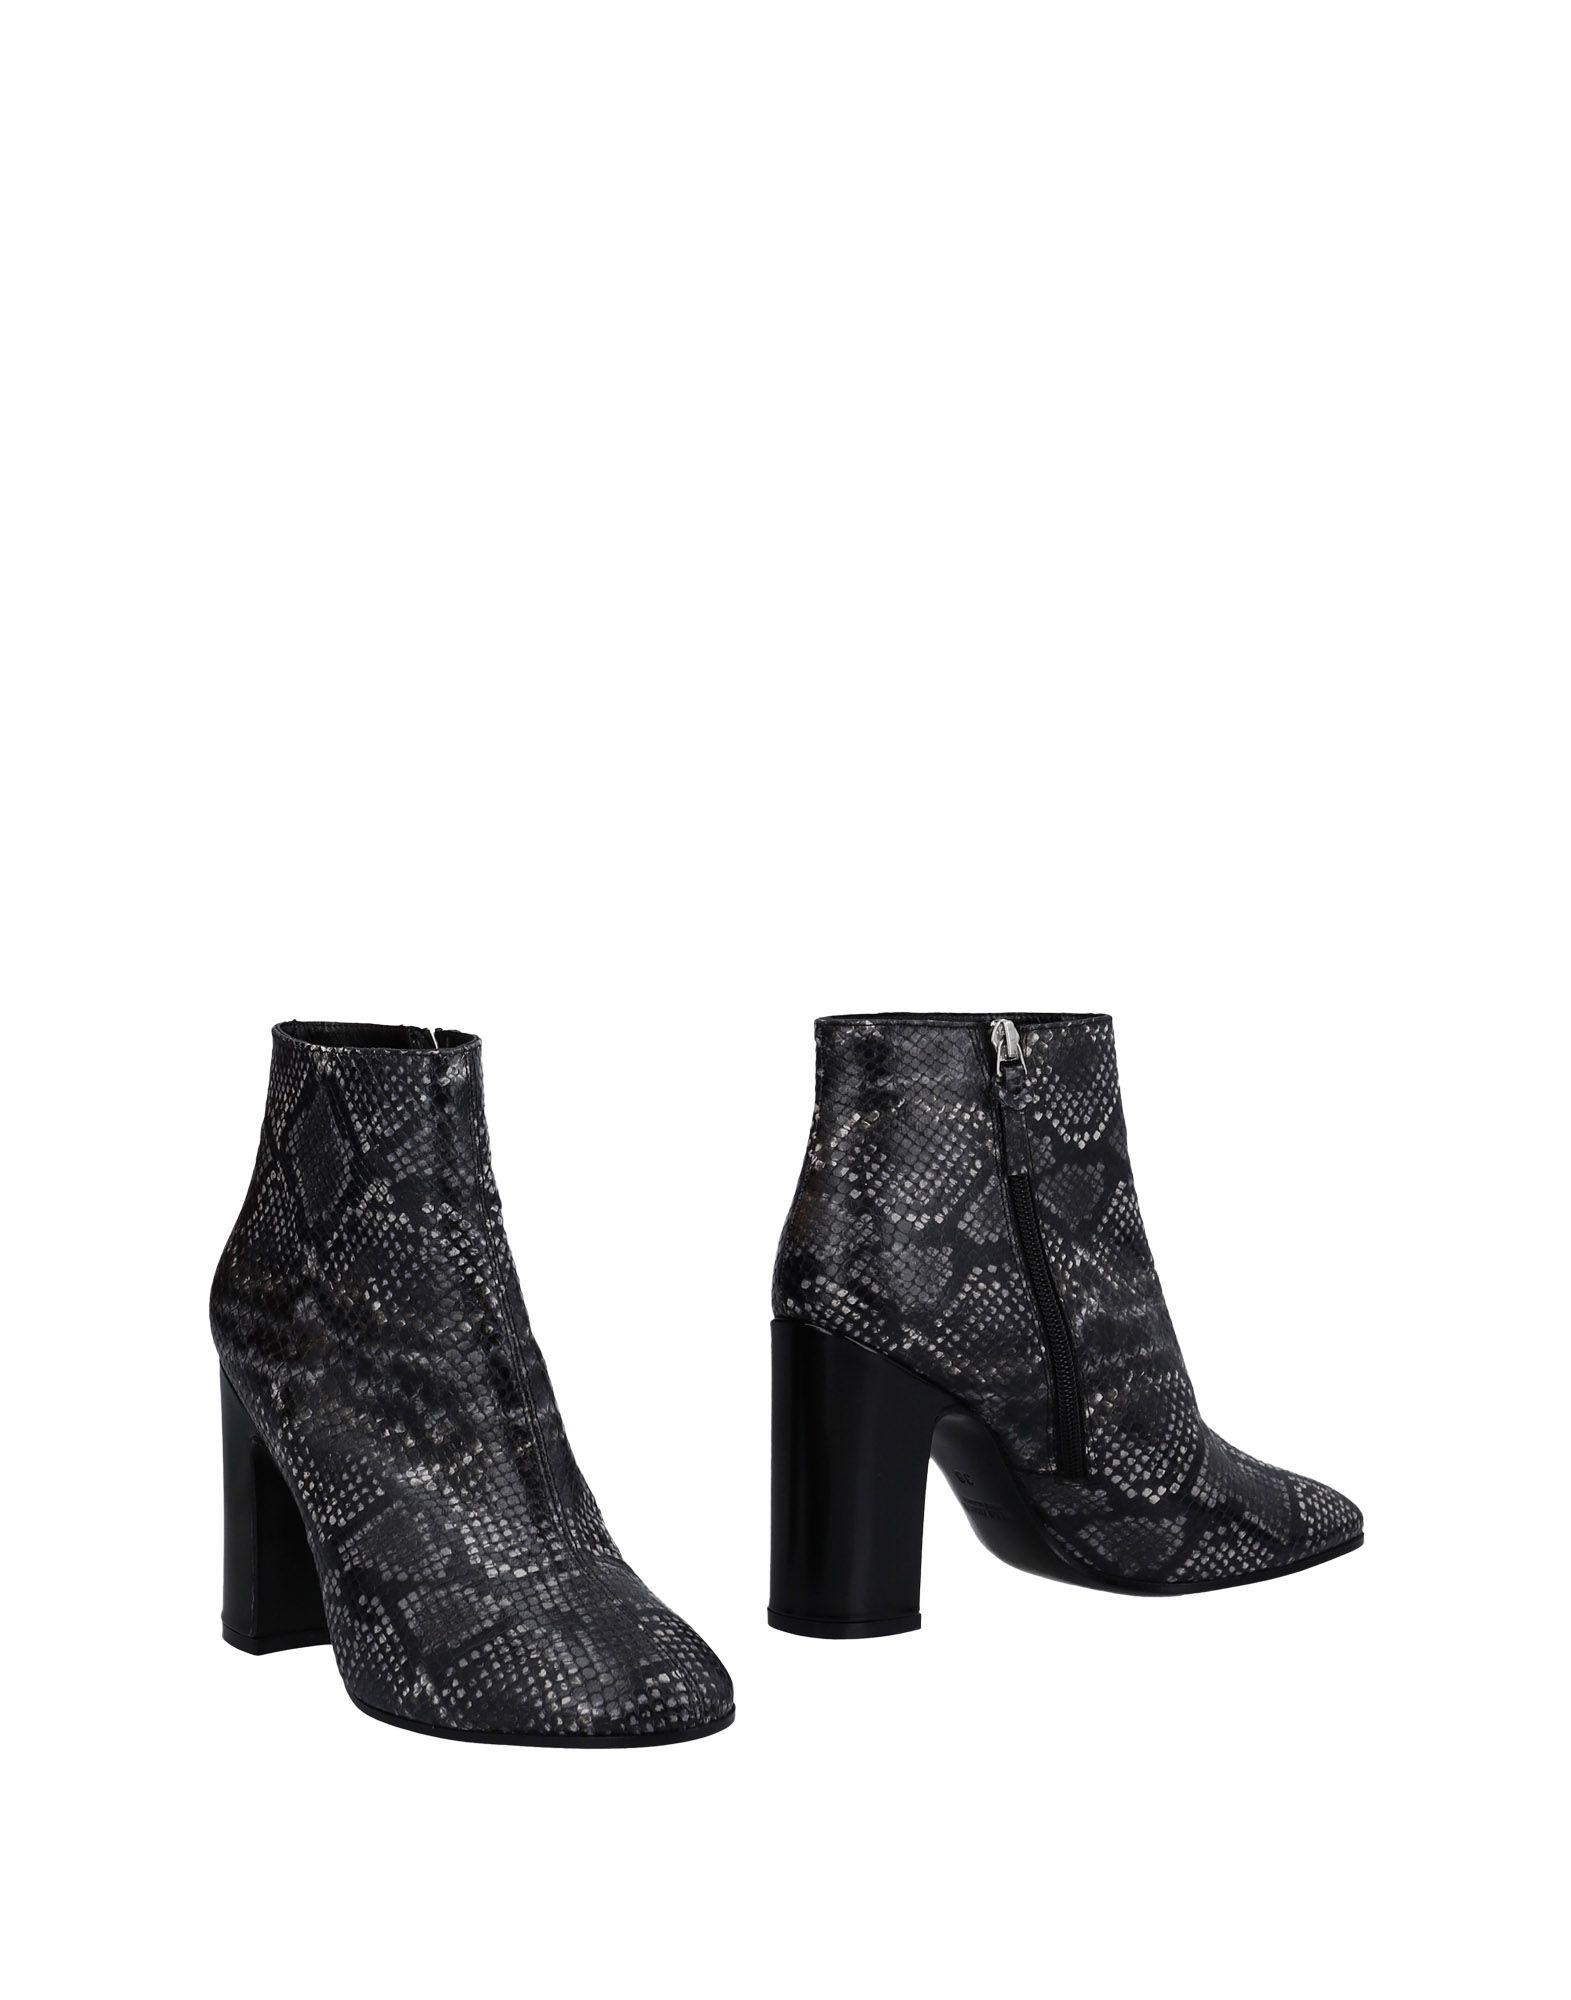 Stilvolle billige Schuhe Schuhe Schuhe Bruschi Stiefelette Damen  11483674UW aa1ade